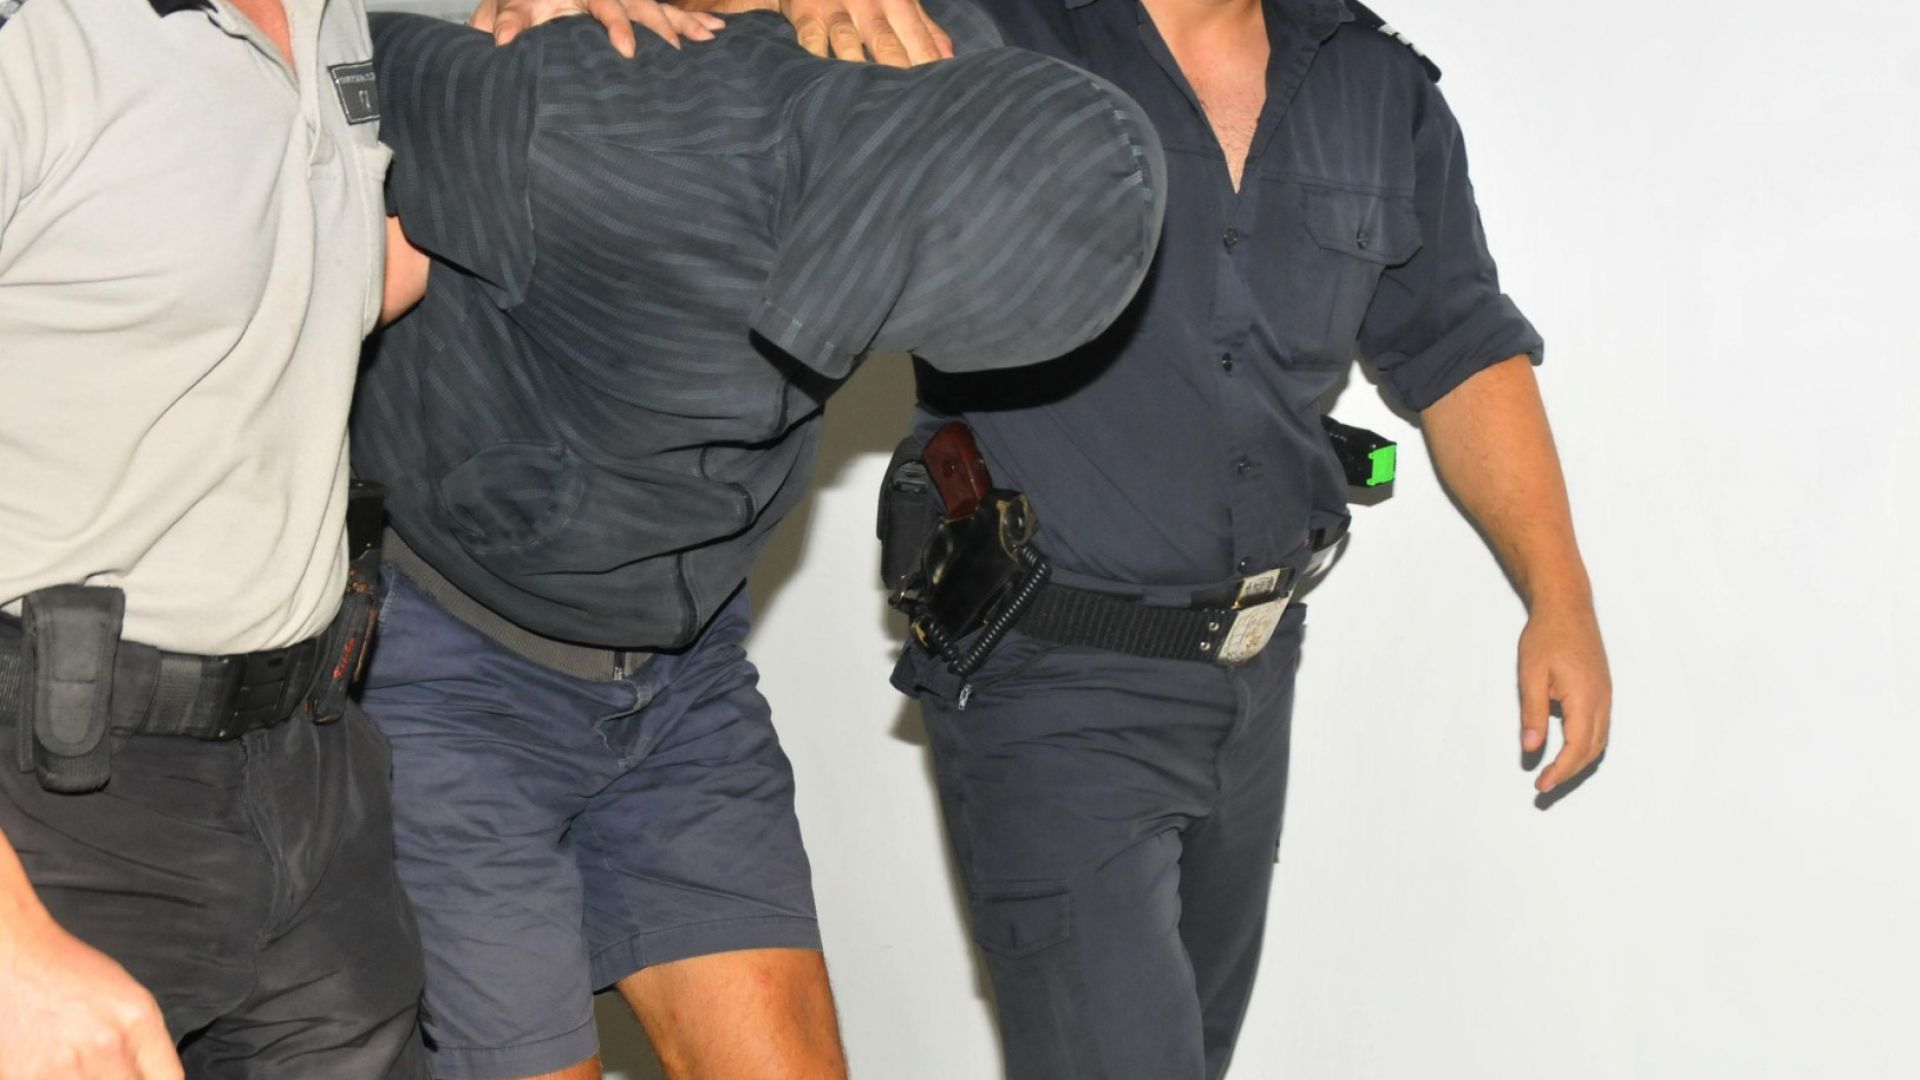 Рецидивистът, отвличал и изнасилвал проститутки, има жена и двама сина